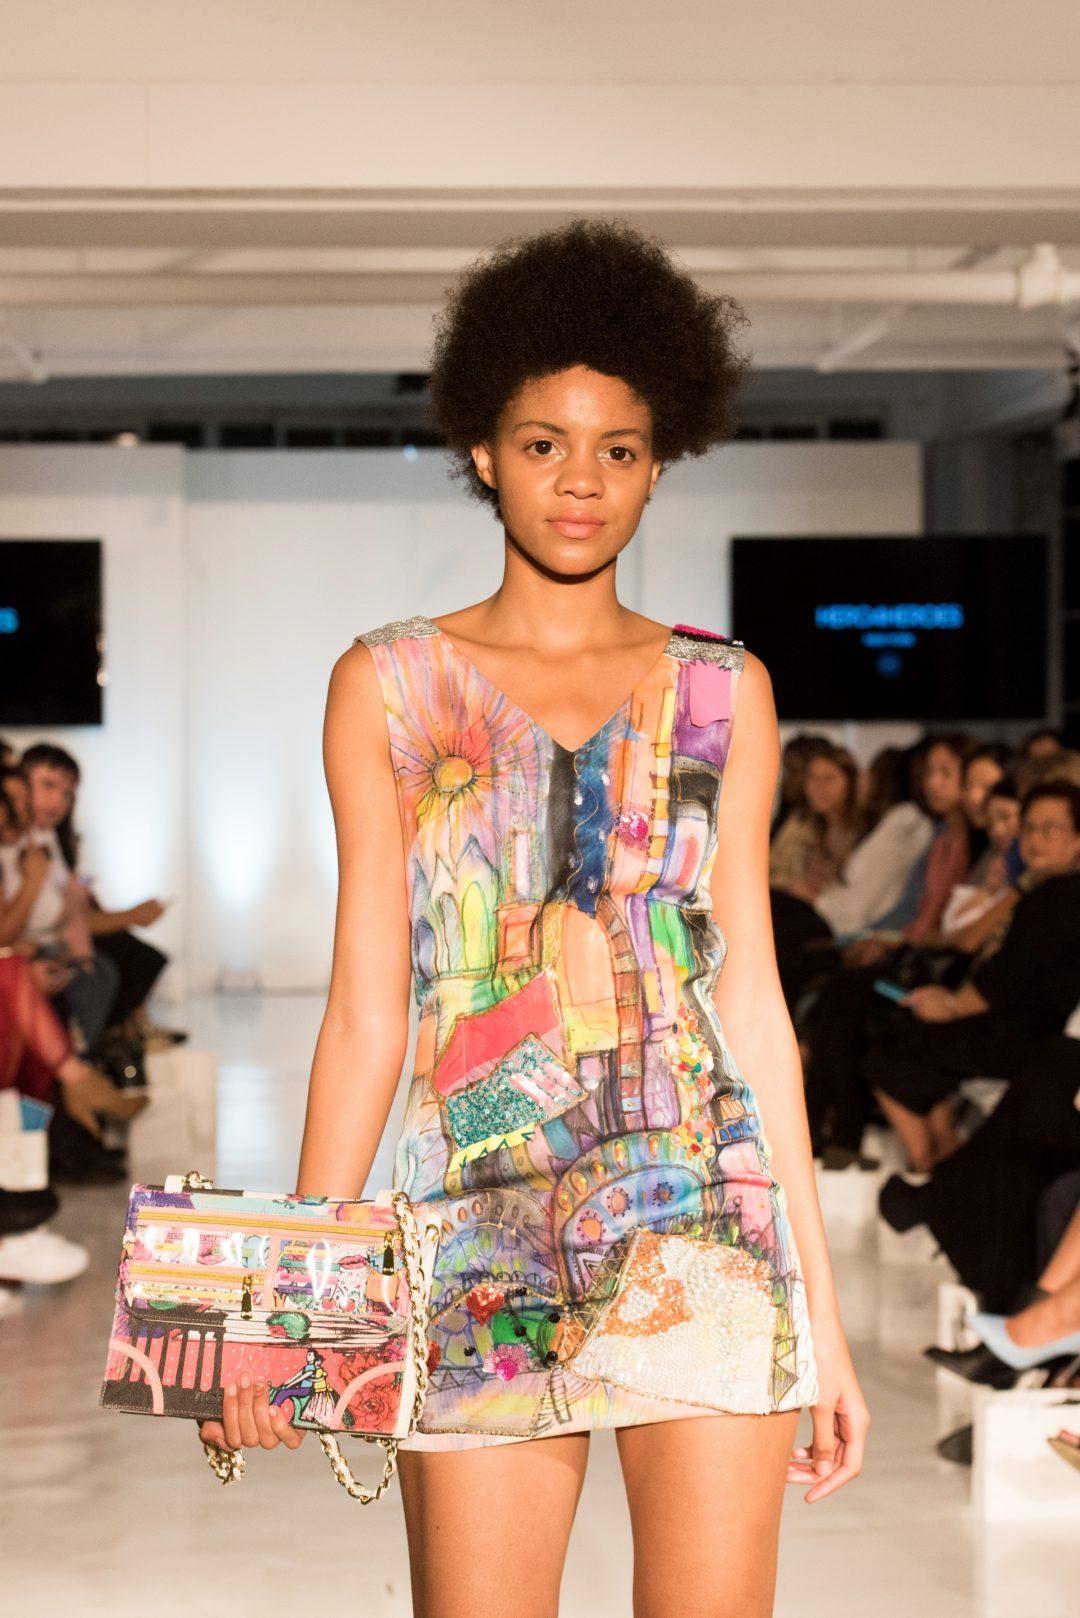 Hero4Heroes on New York fashion week